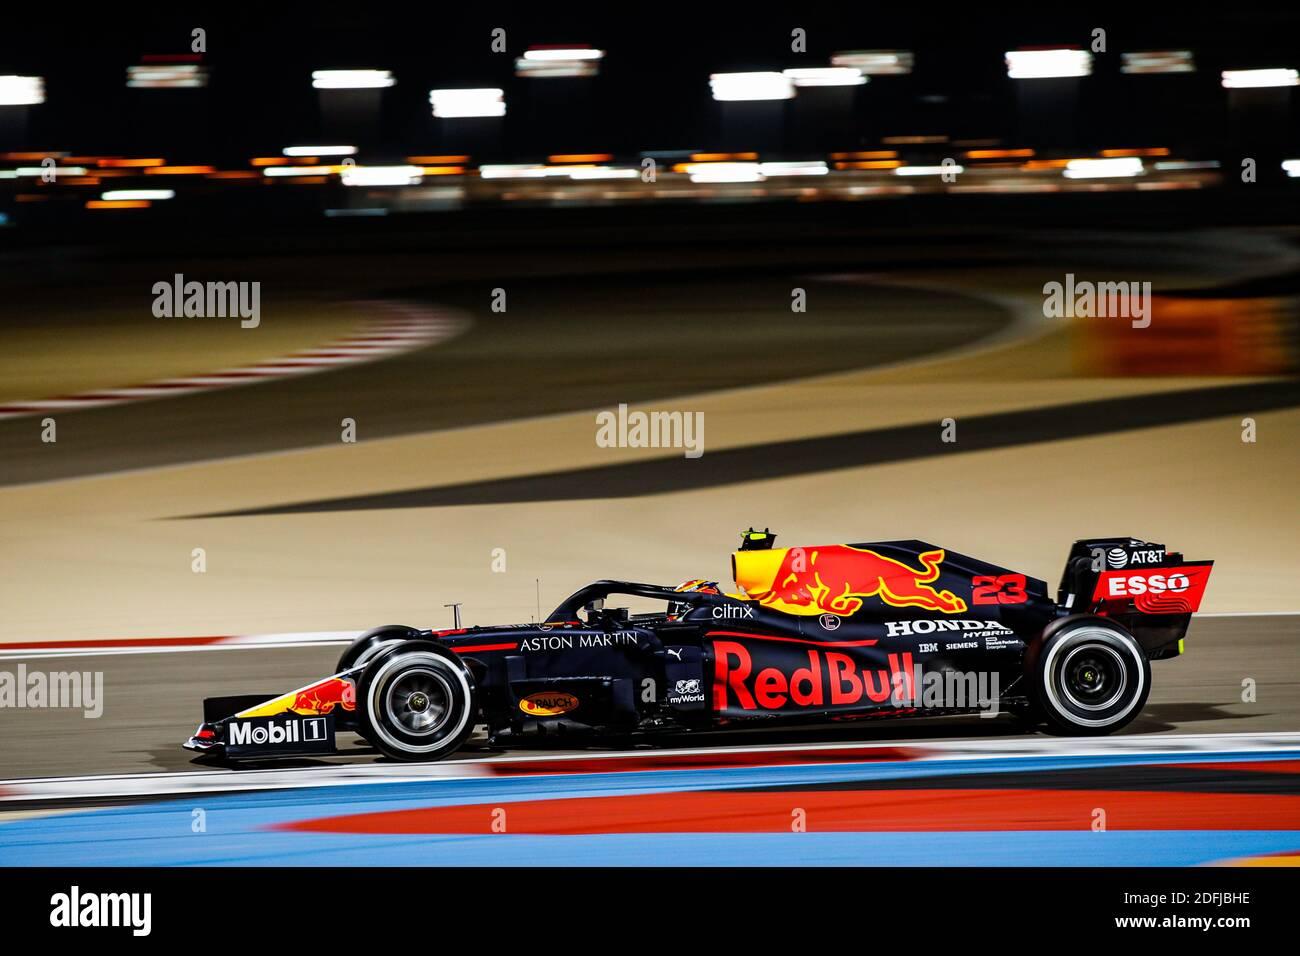 23 Albon Alexander Tha Aston Martin Red Bull Racing Honda Rb16 Action During The Formula 1